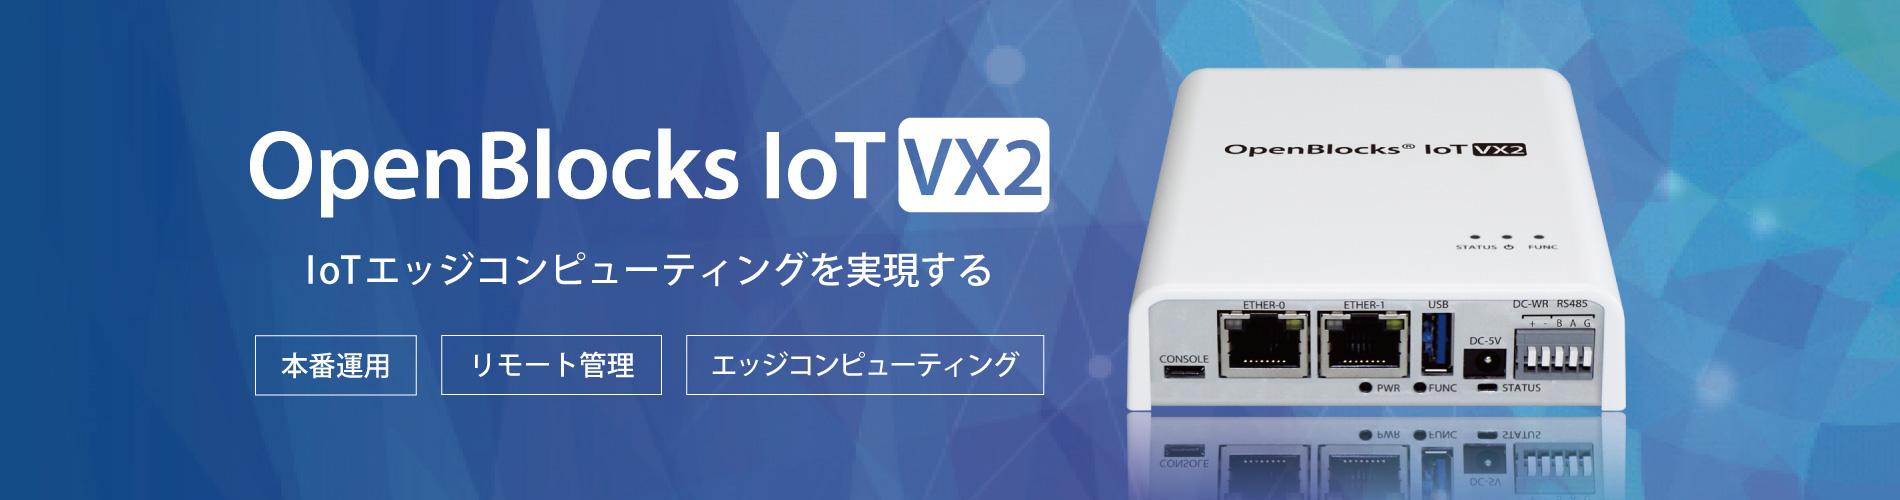 OpenBlocks IoT VX2/W Windows(R)搭載エッジコンピューティングIoTゲートウェイ